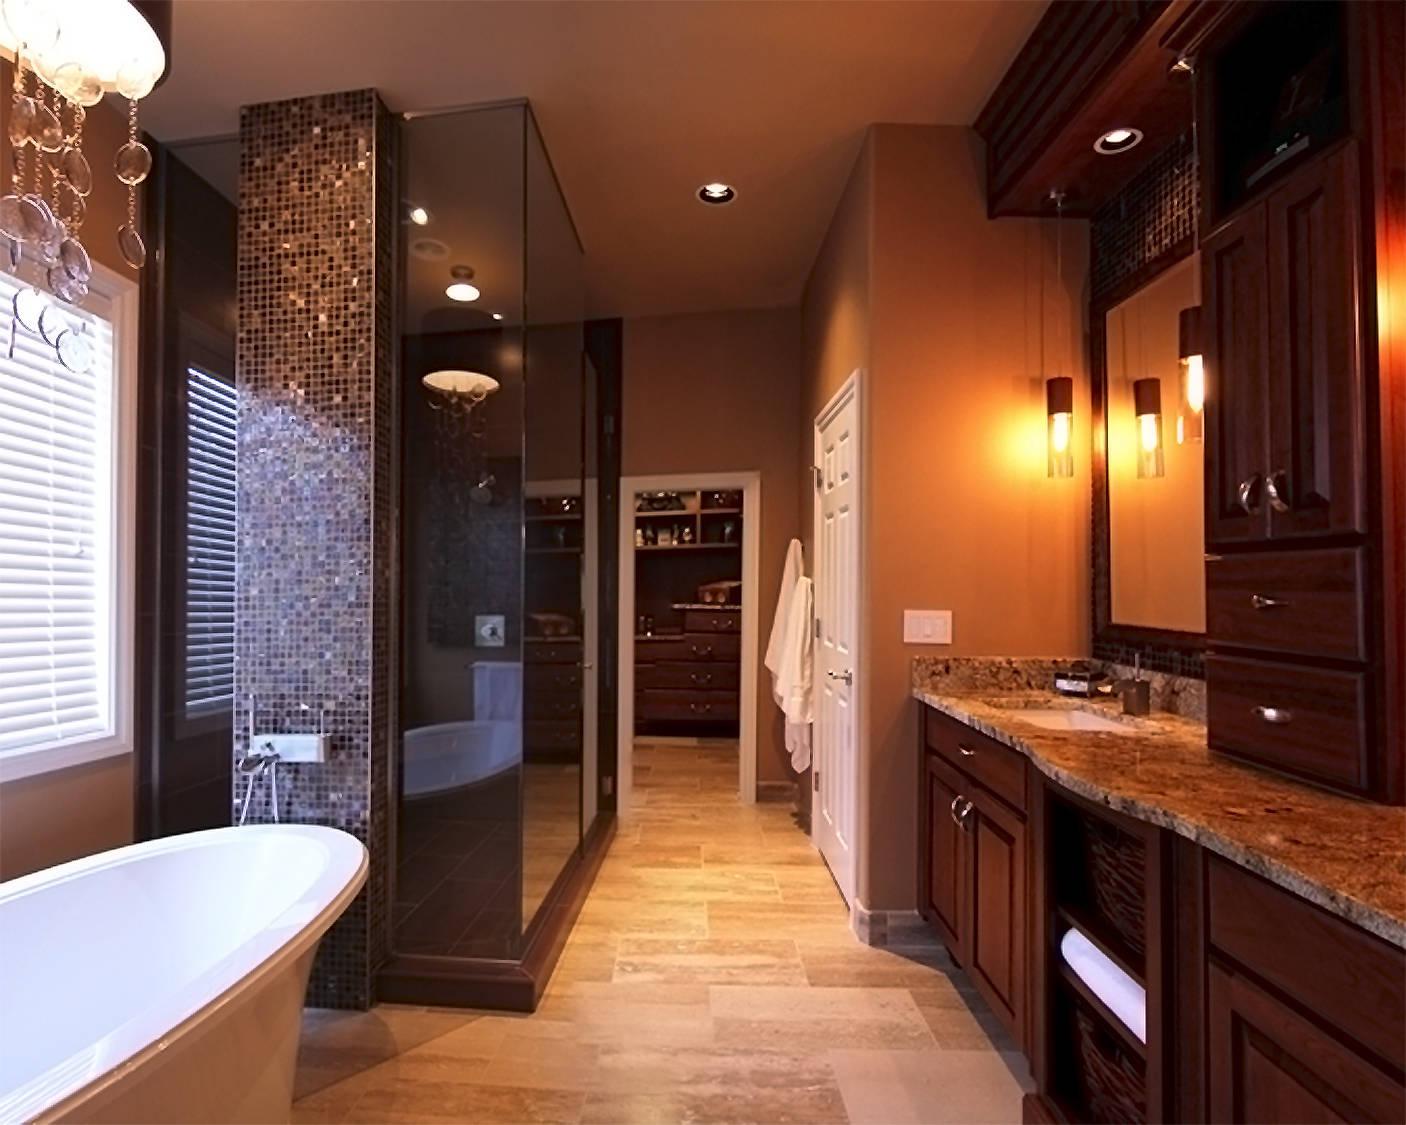 spa_like_bathroom_remodel